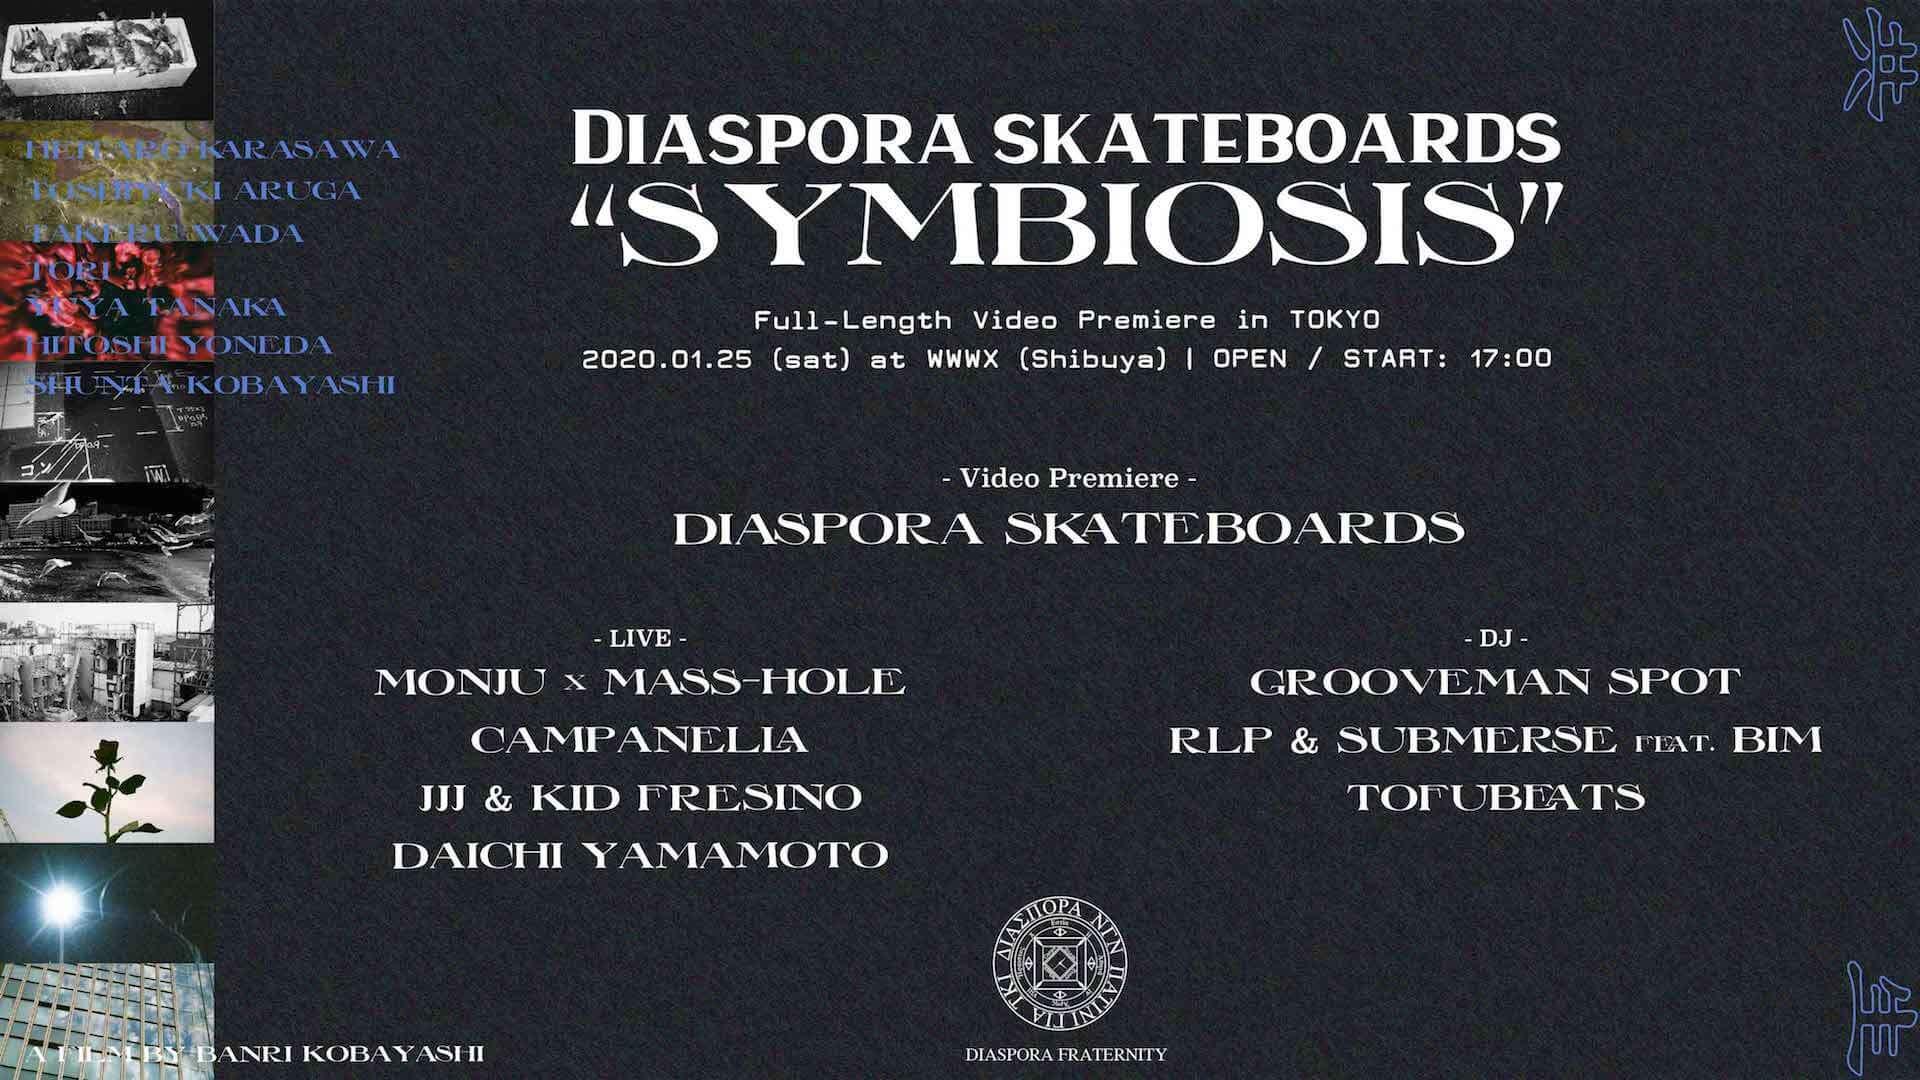 Diaspora skateboardsの新作ビデオ『SYMBIOSIS』の試写イベントにDaichi Yamamoto、tofubeatsが追加出演決定|アフターパーティーにAru-2、Kazuhiko Fujitaも music191226_diasporaskateboards_2